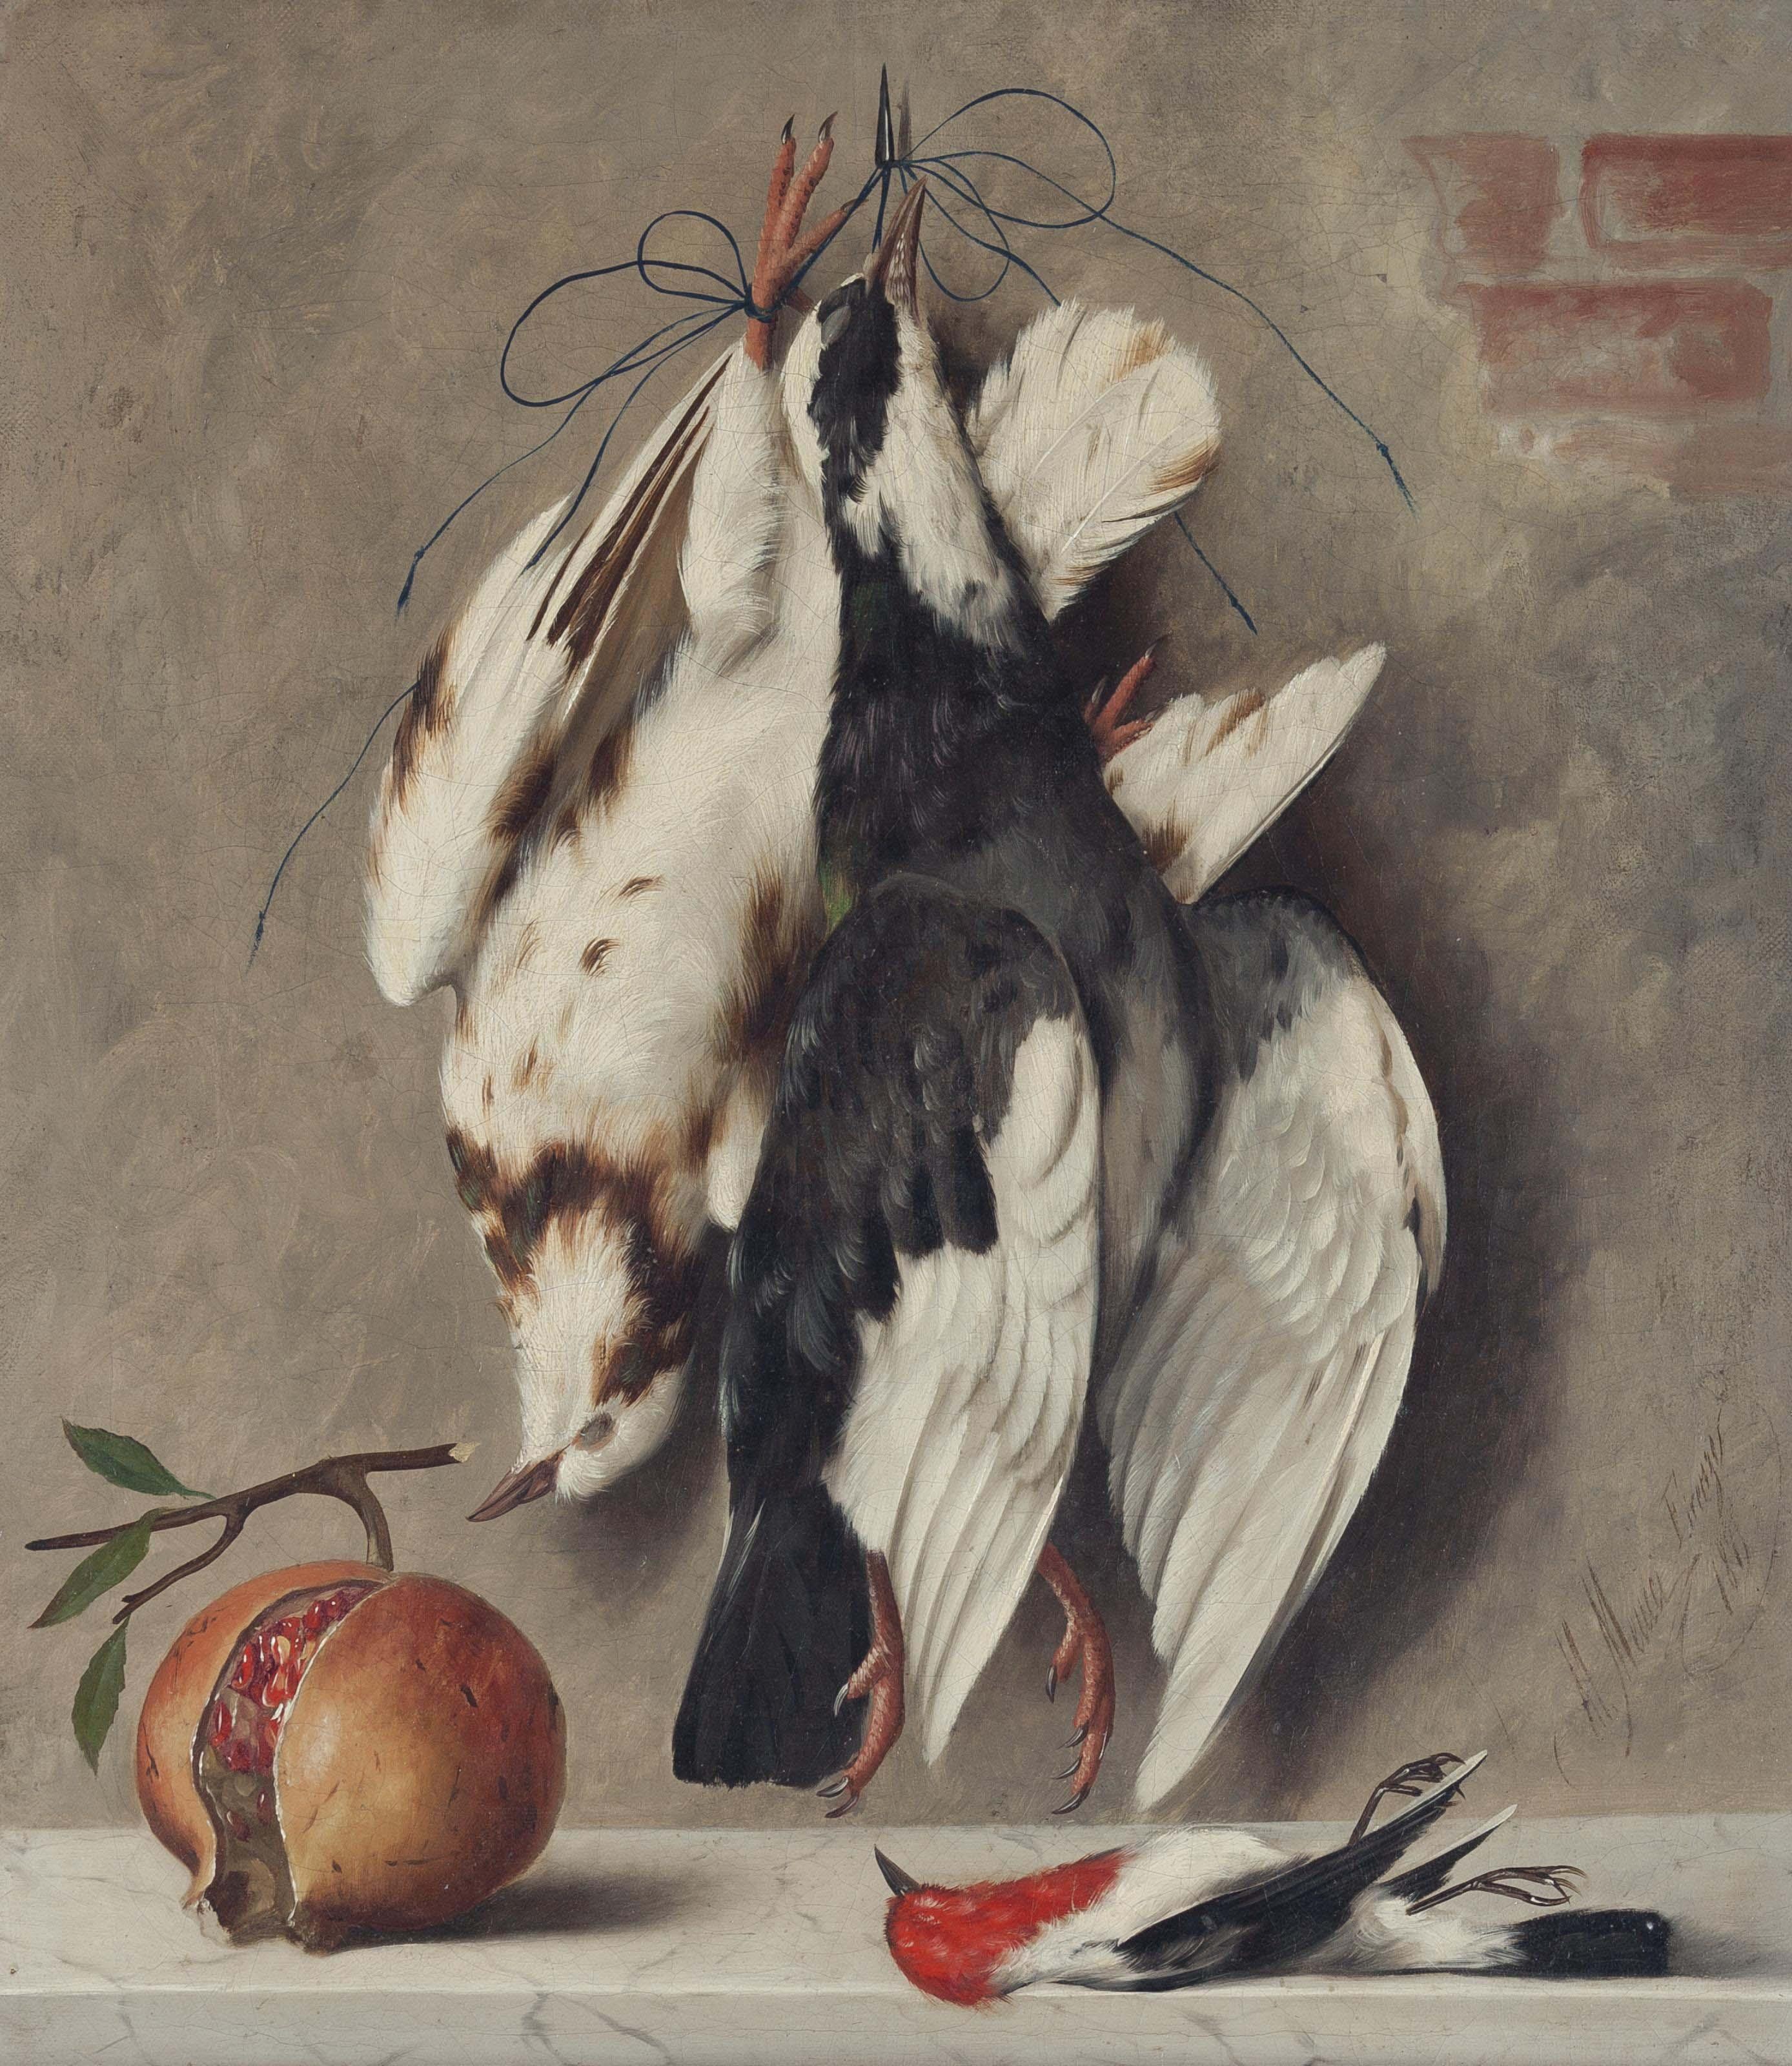 Natura morta; and a companion painting